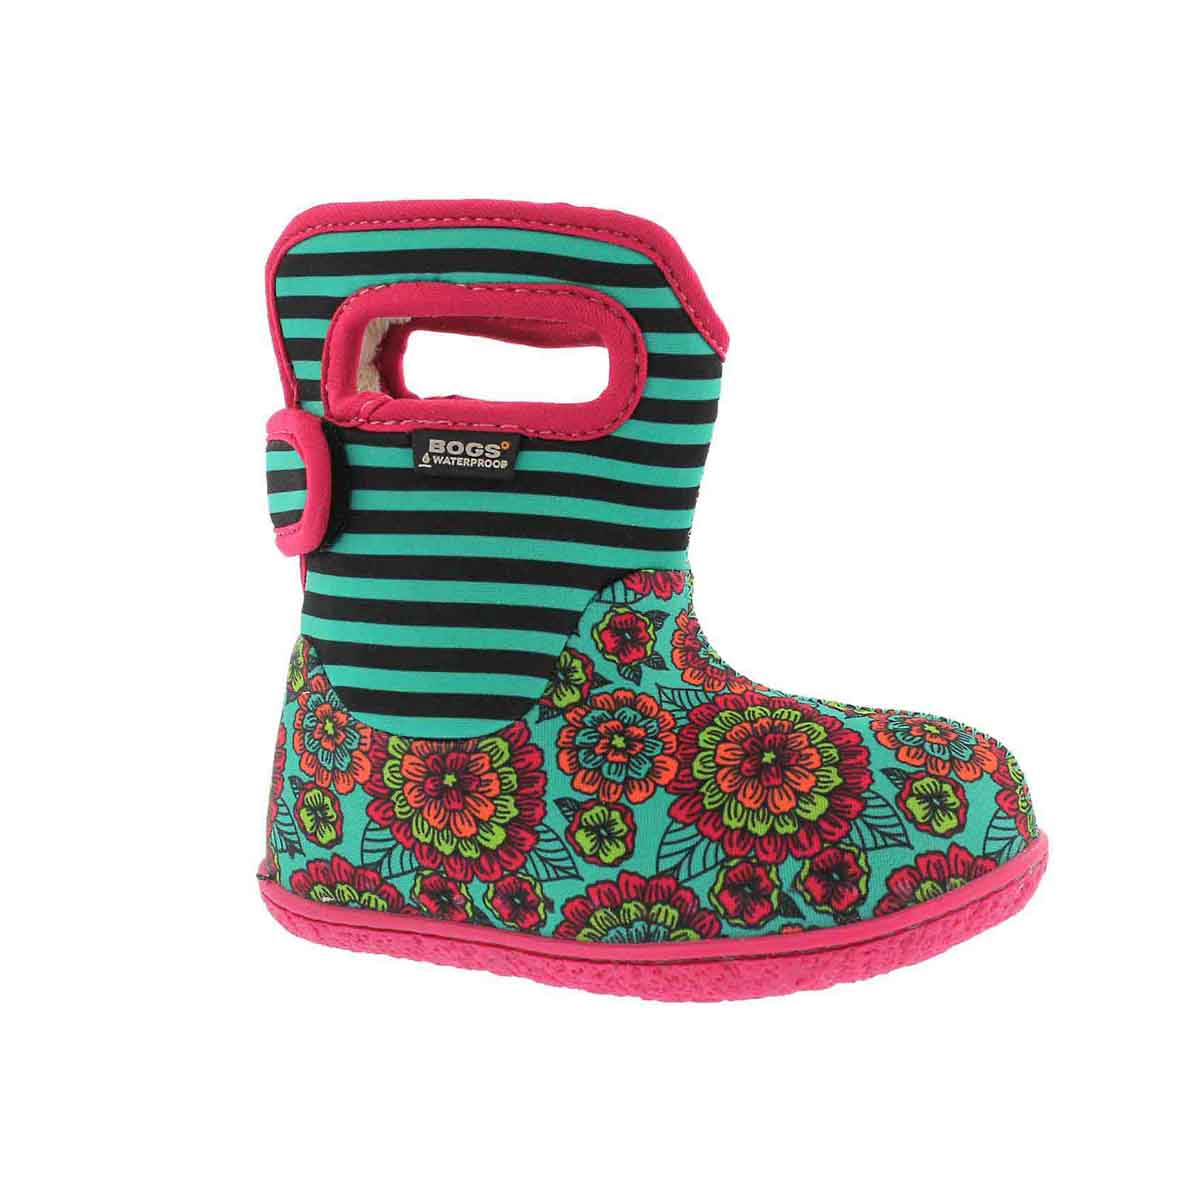 Infant girls PANSY STRIPE emerald mult boot